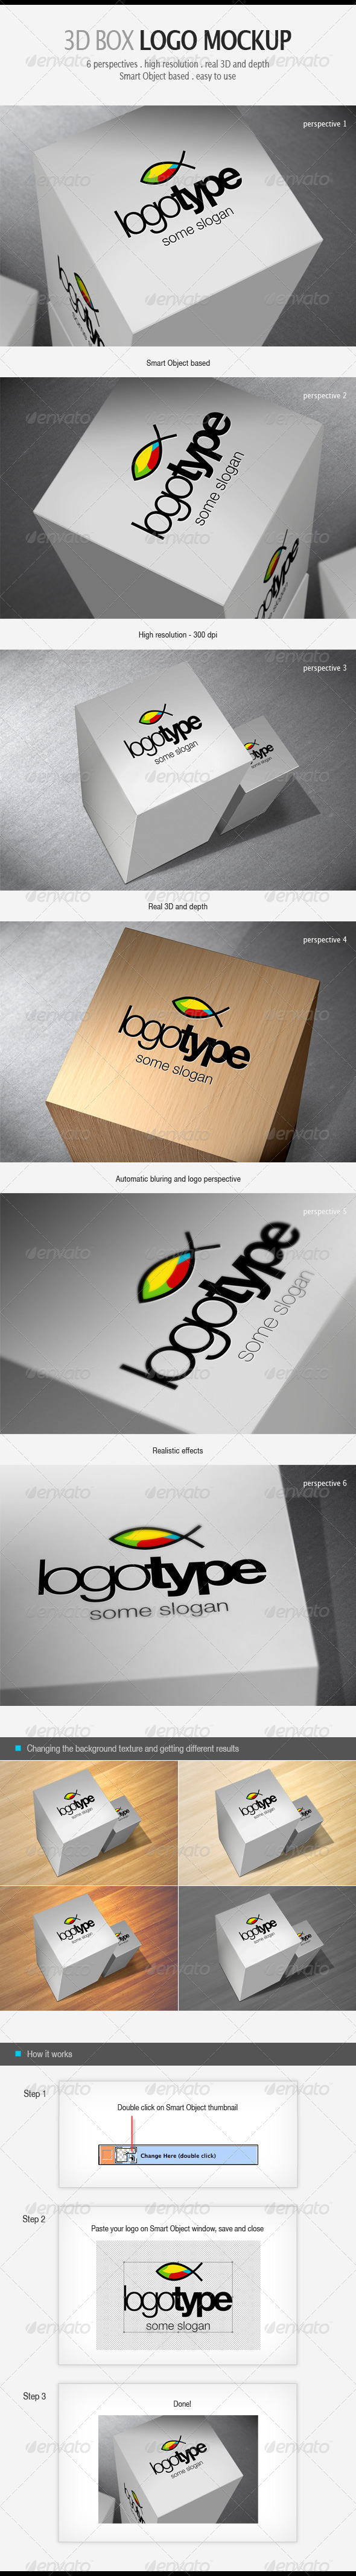 GraphicRiver 3D Box Logo Mockup 5212099